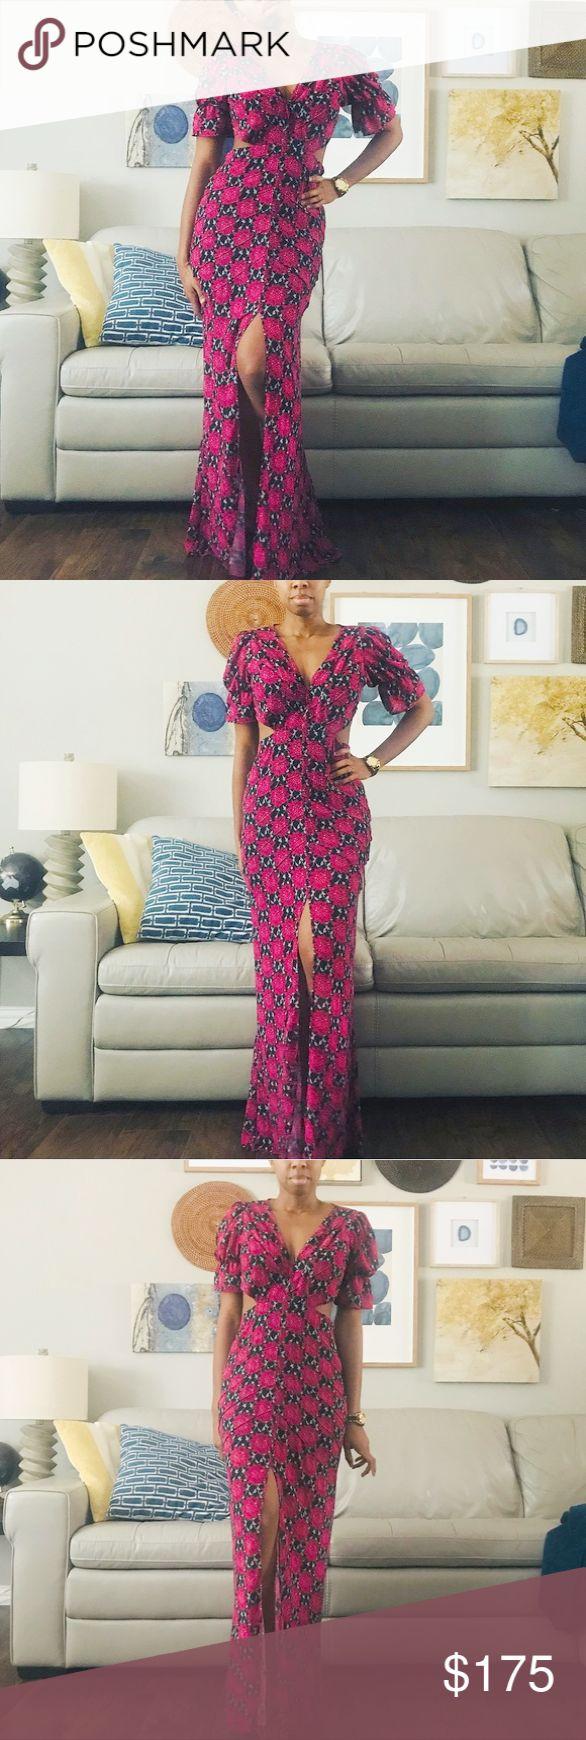 spree dress fashion nova plus size  new fashion dress for